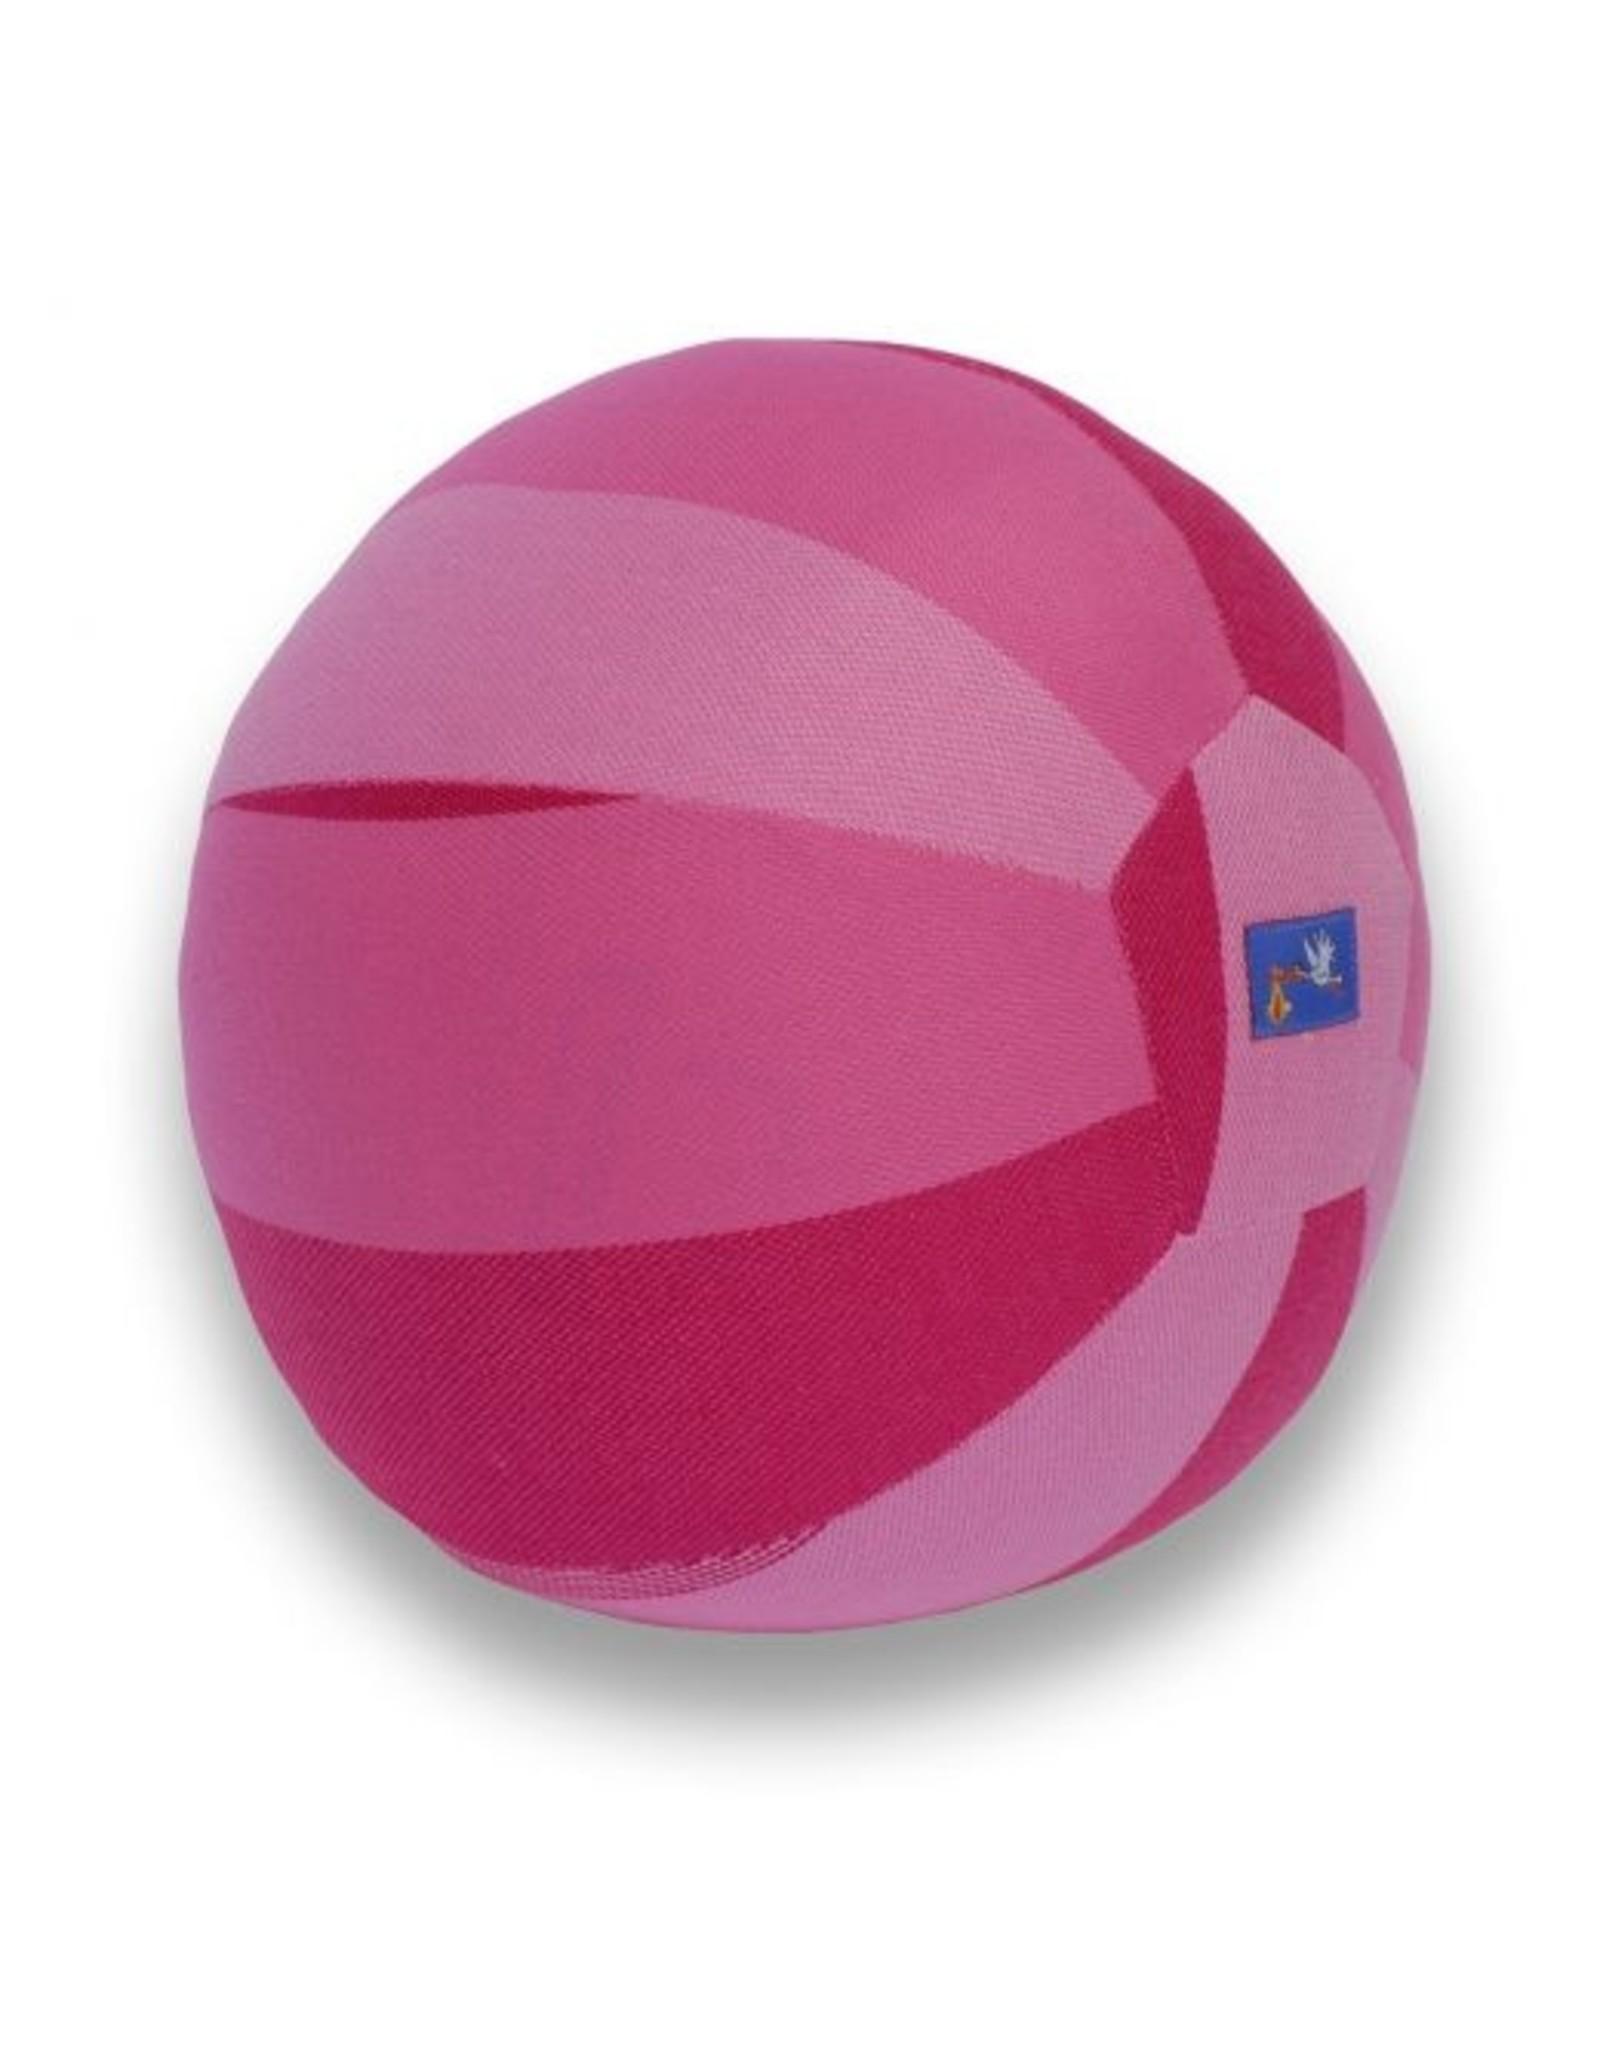 Hoppediz Hoppediz ballonbal Miami roze van draagdoekenstof